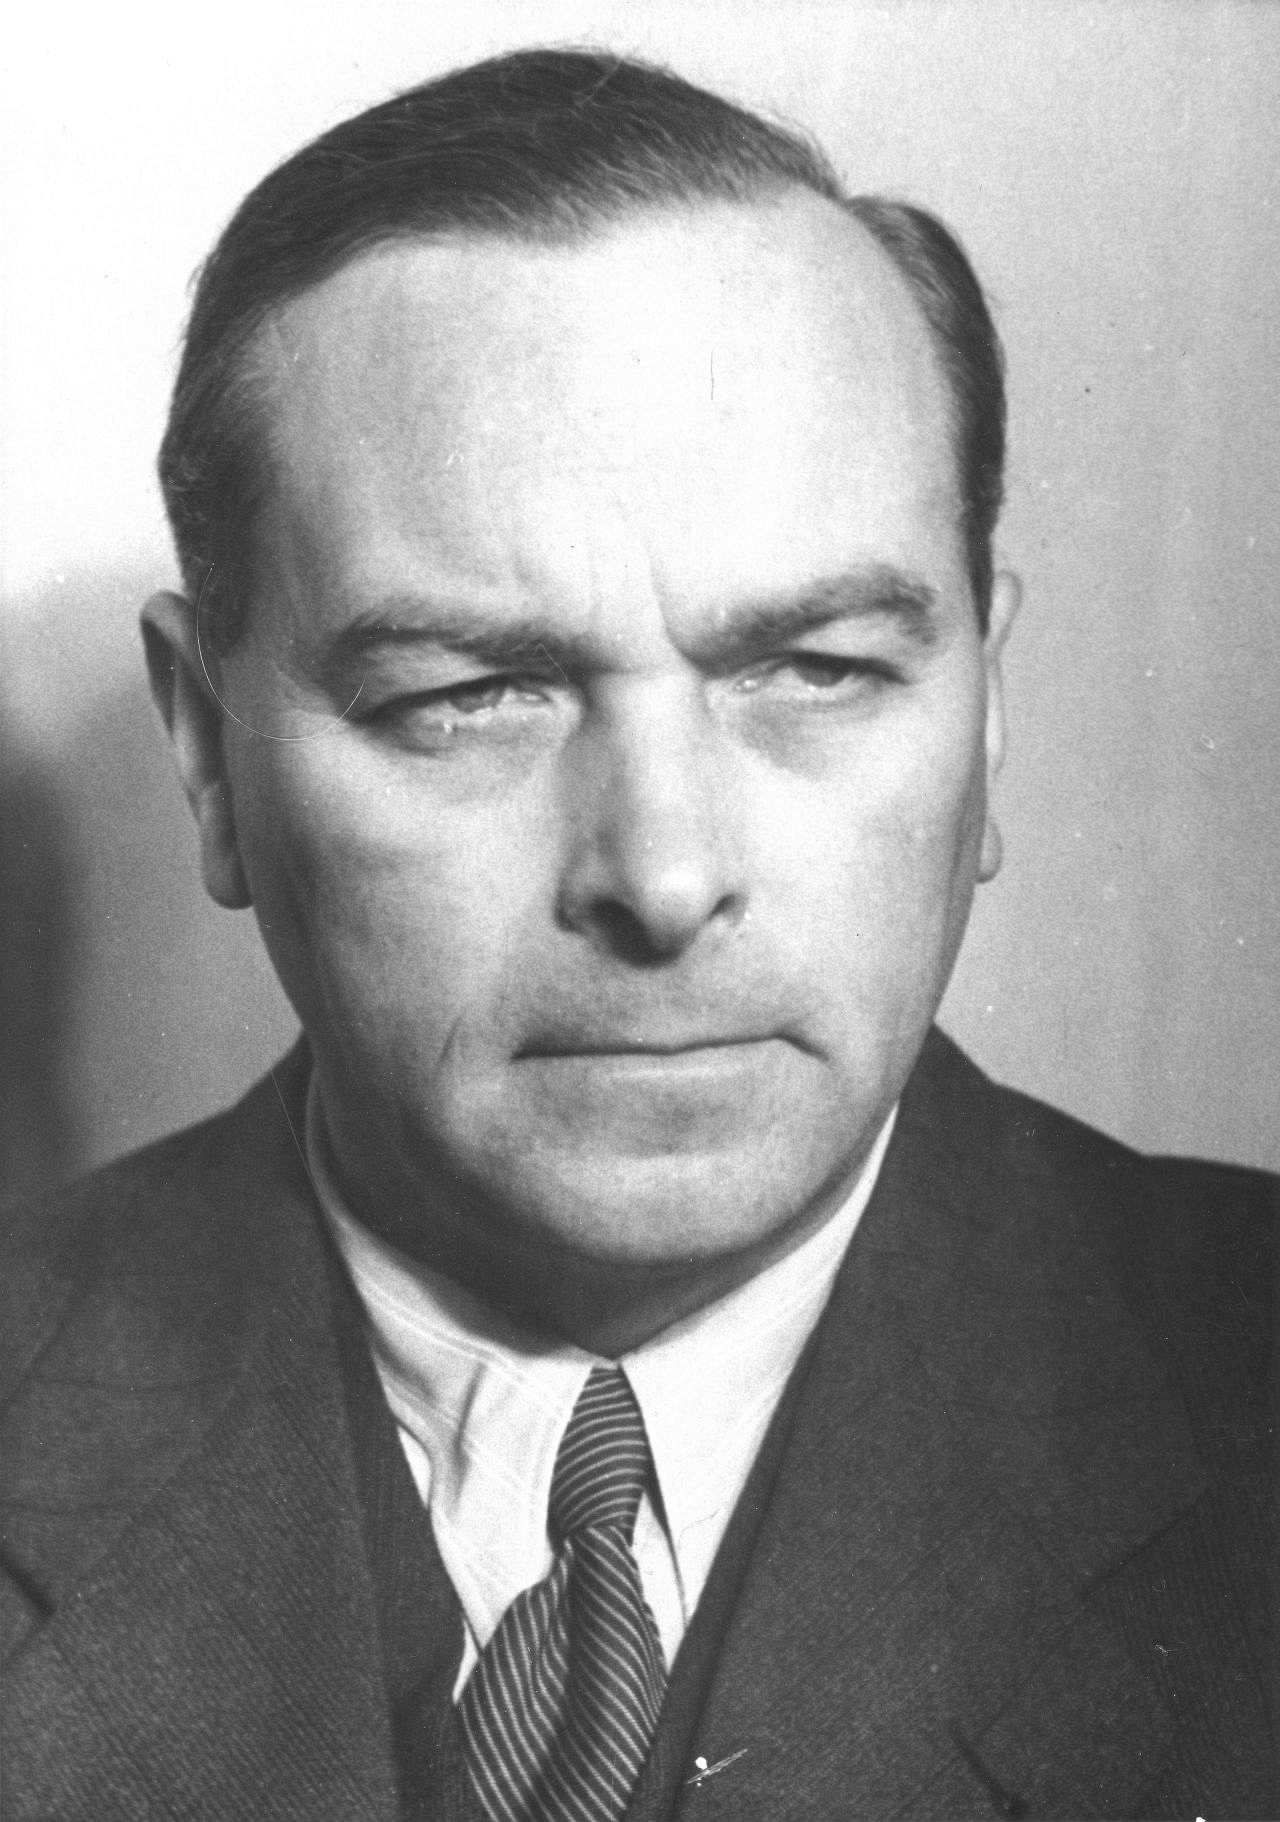 Fritz Hamann